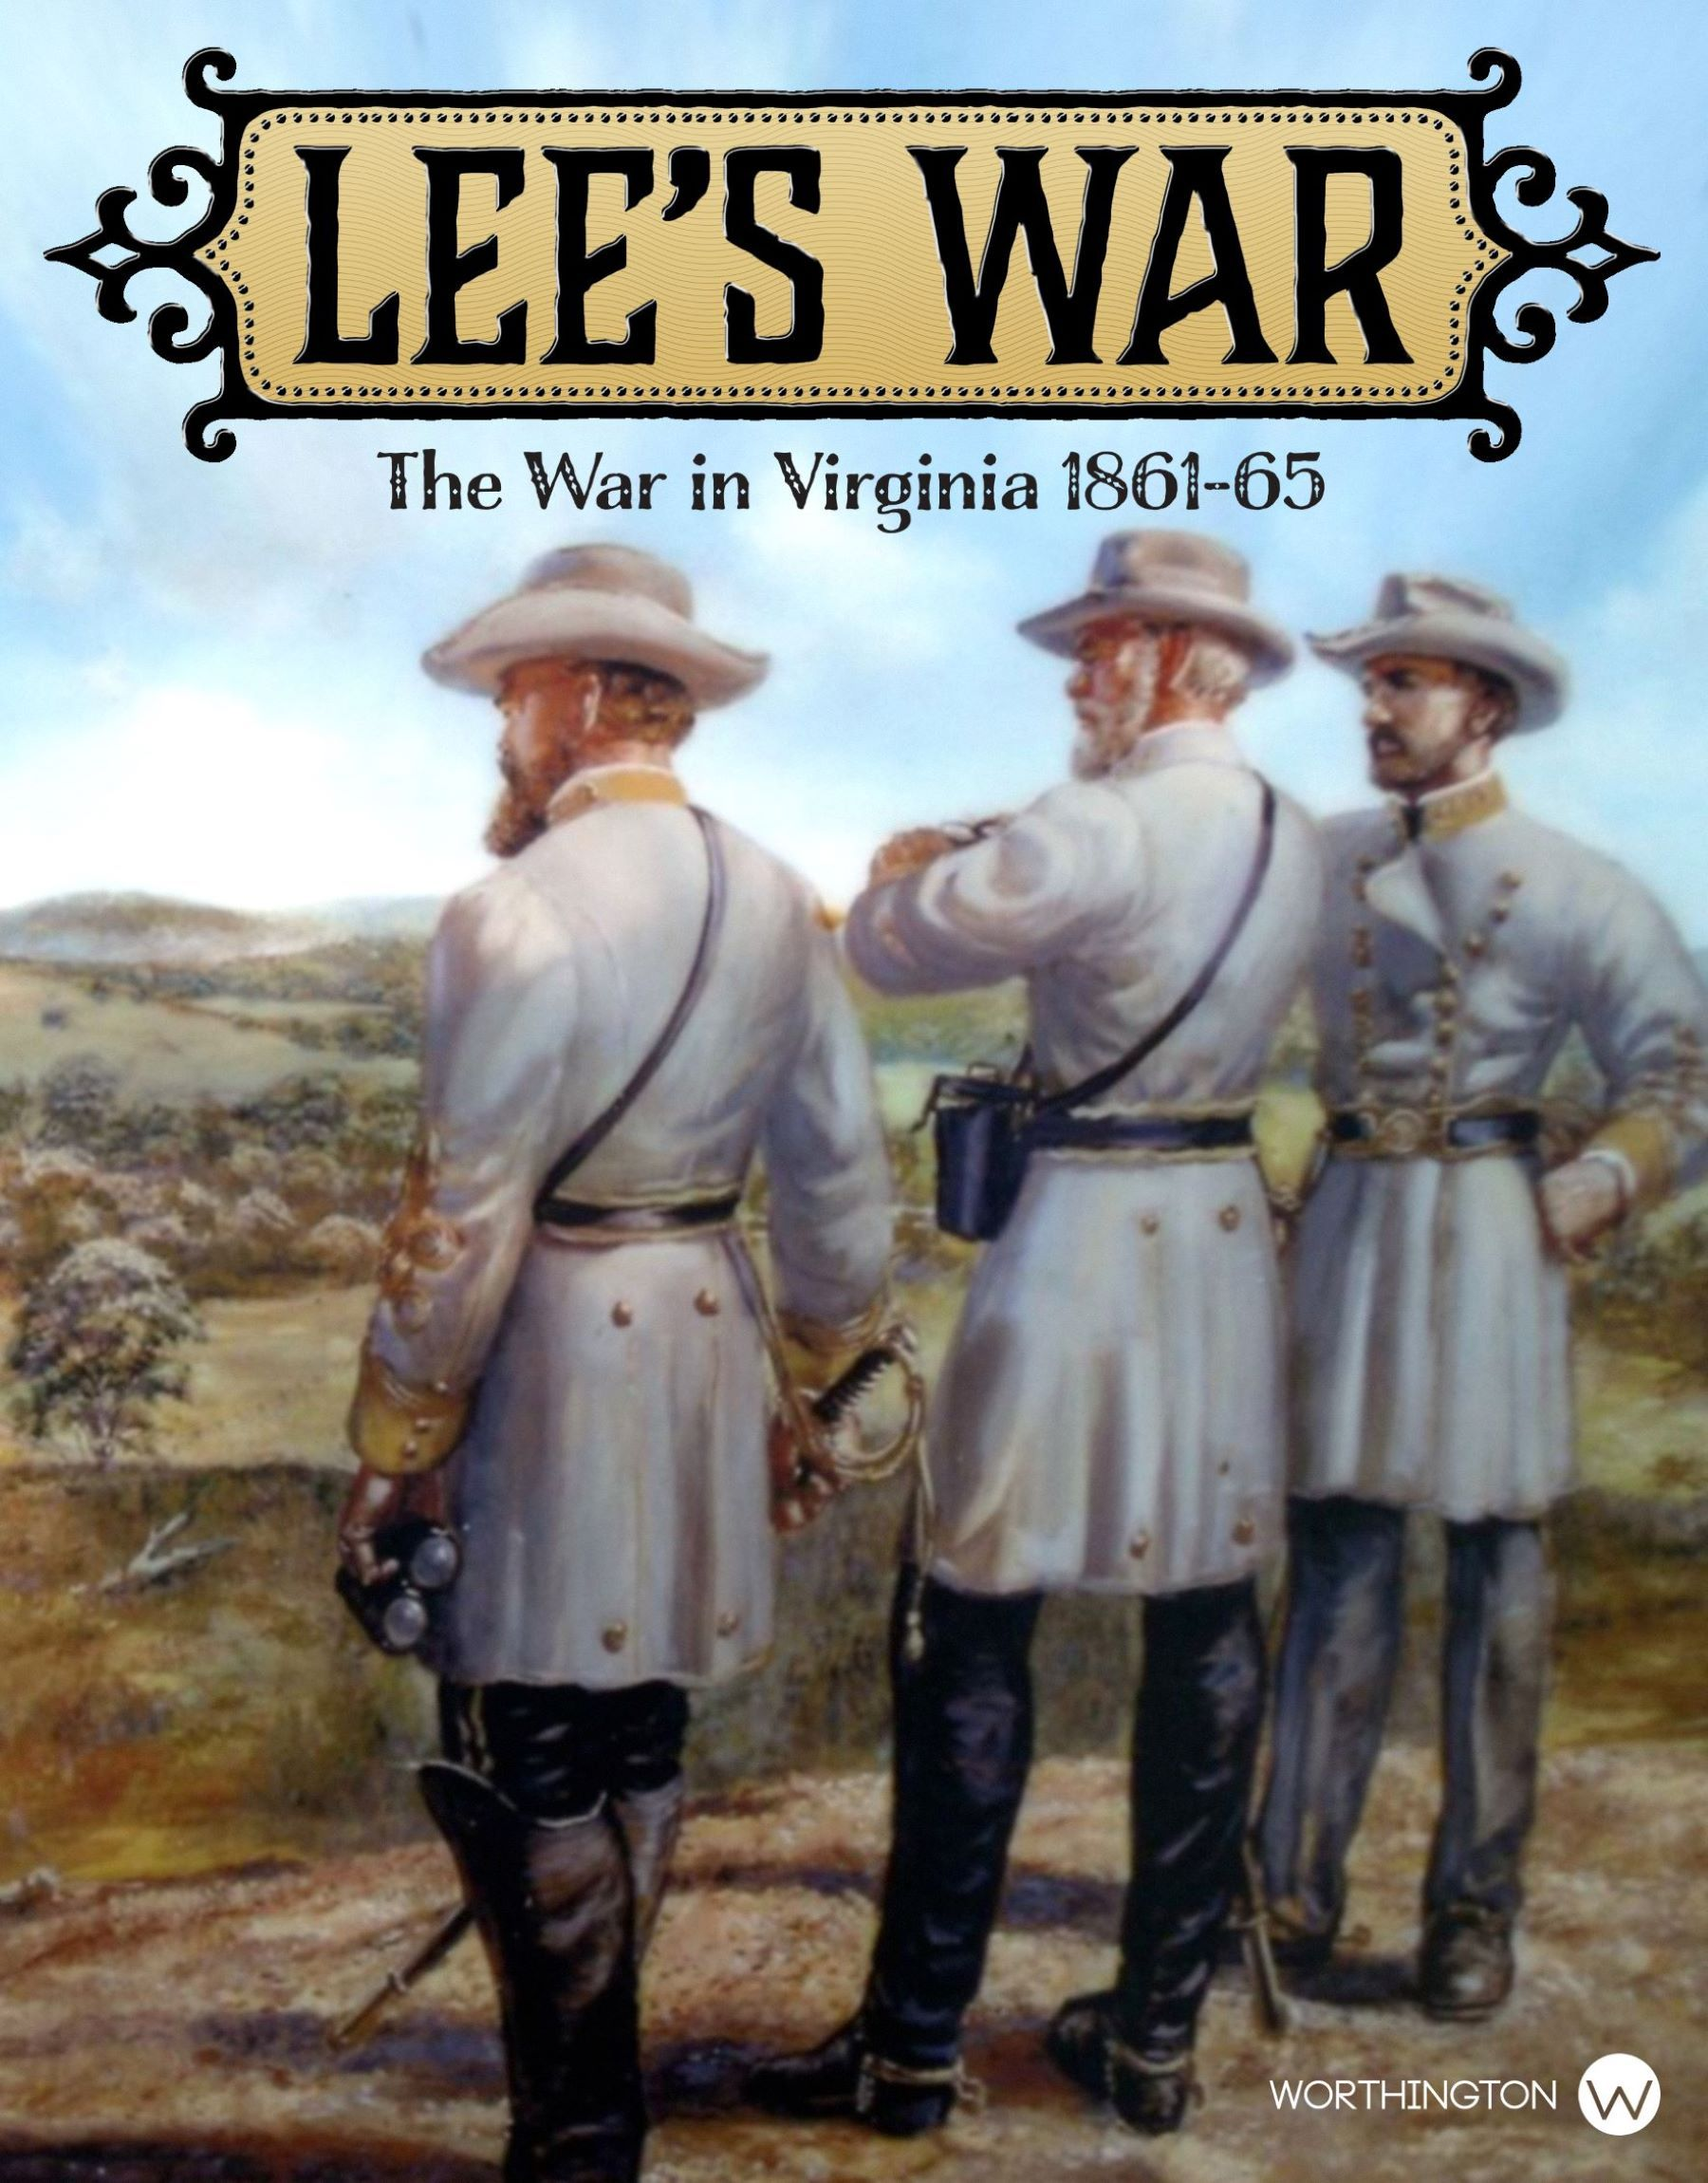 Lee's War